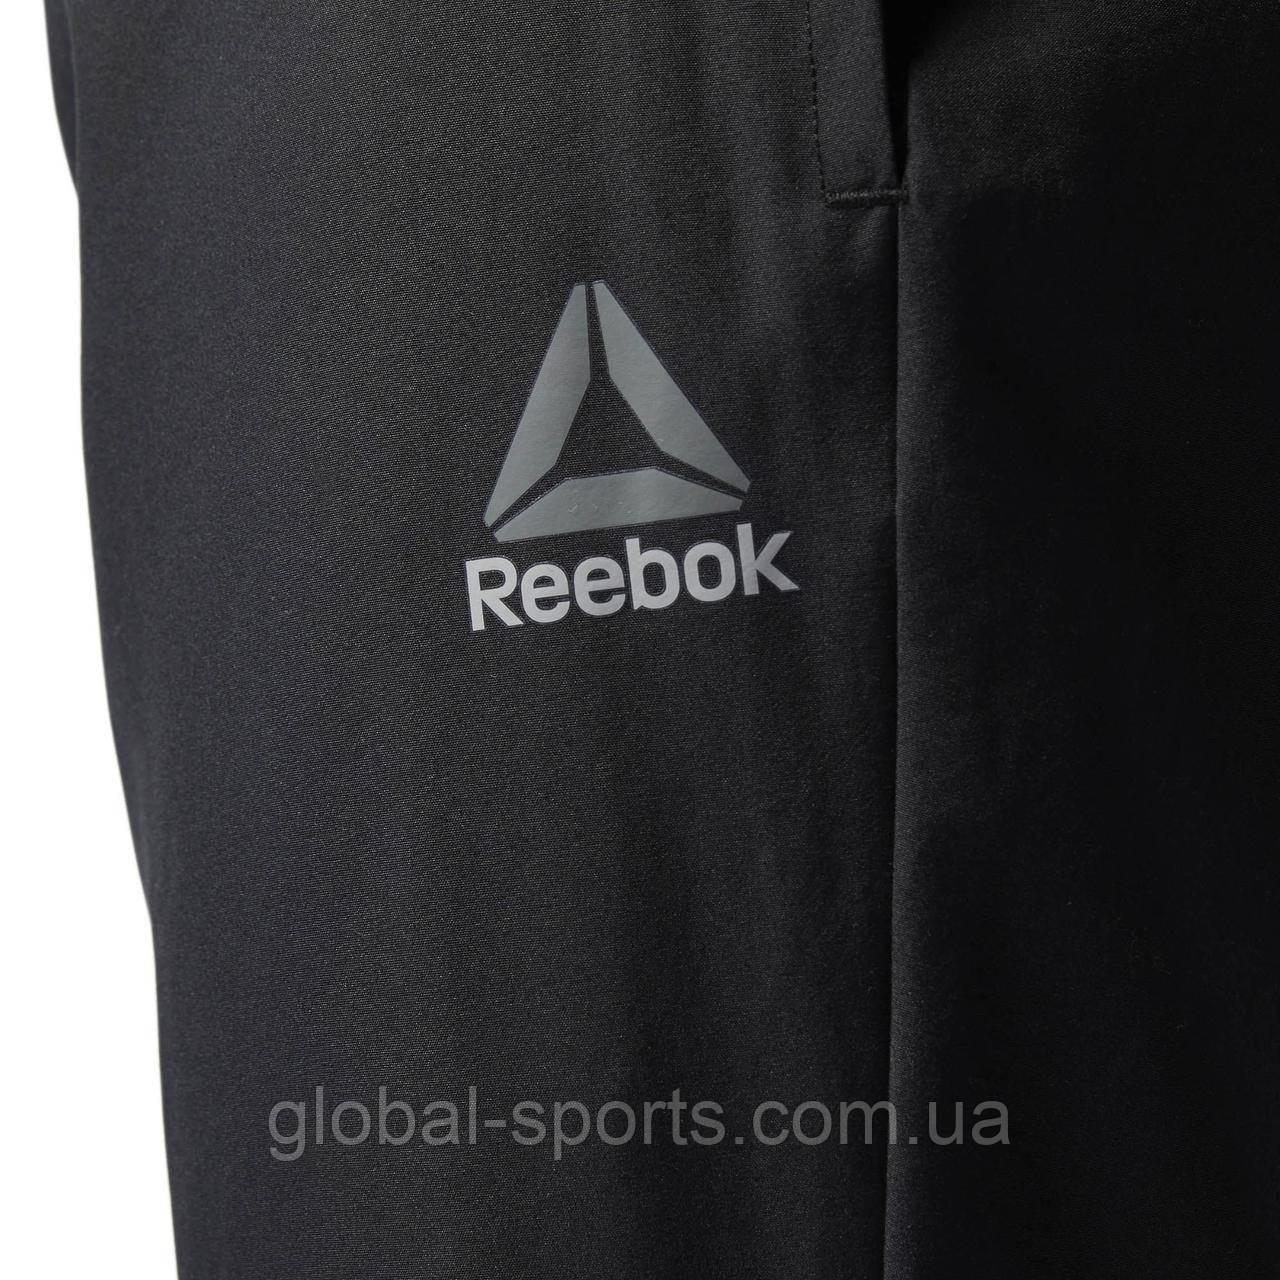 65d75352 ... Мужской спортивный костюм Reebok CUFFED TRACKSUIT(АРТИКУЛ:BQ5864), ...